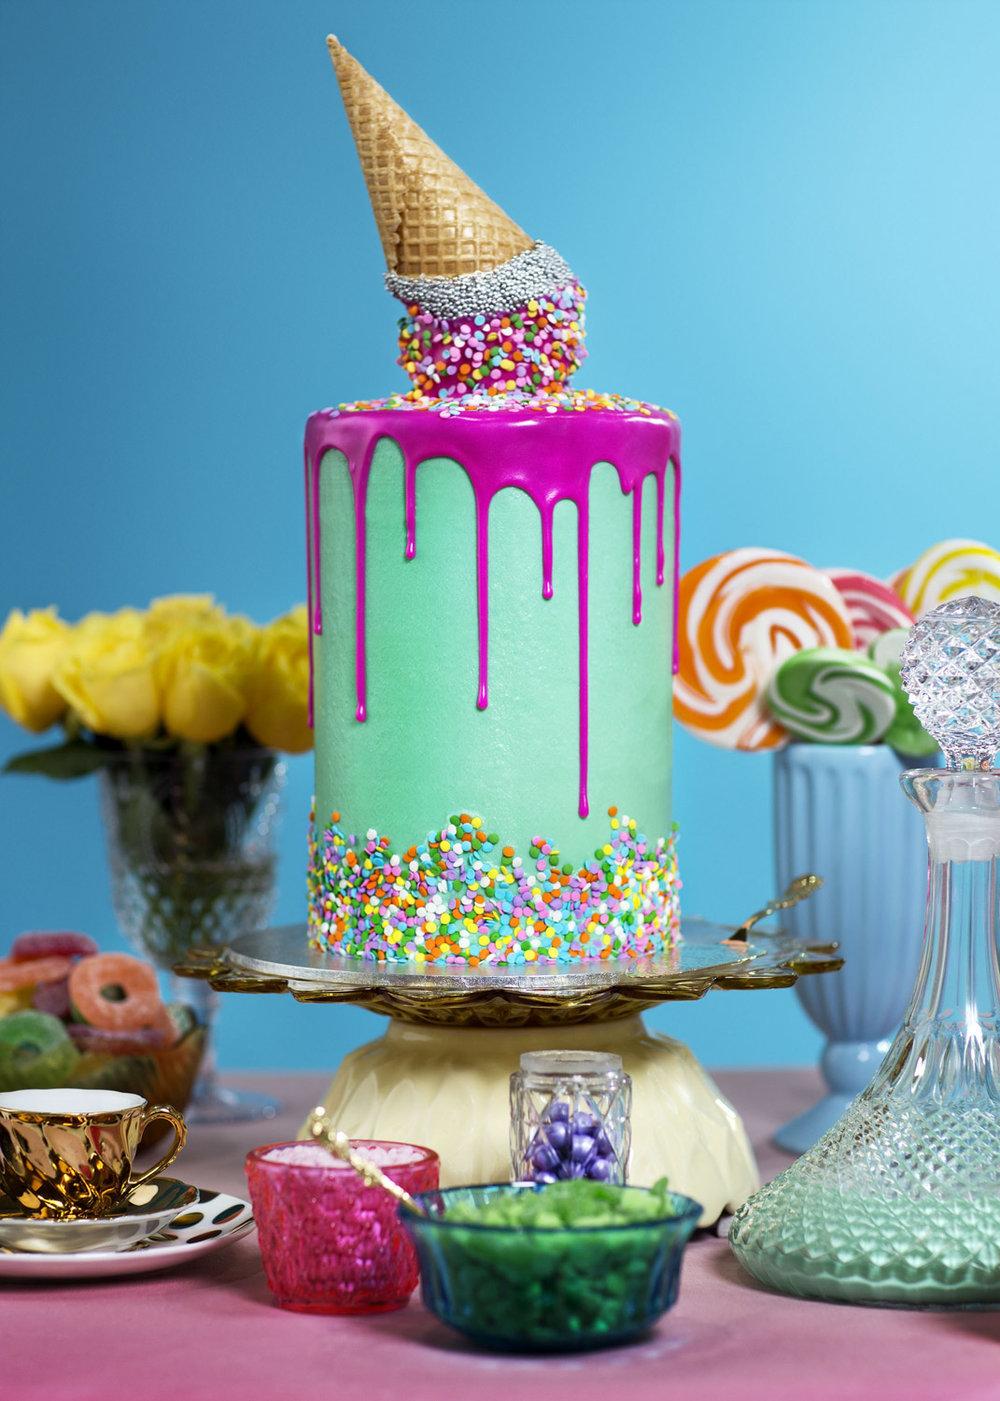 Let Them Eat Cake13451_JP_1a LR1.jpg